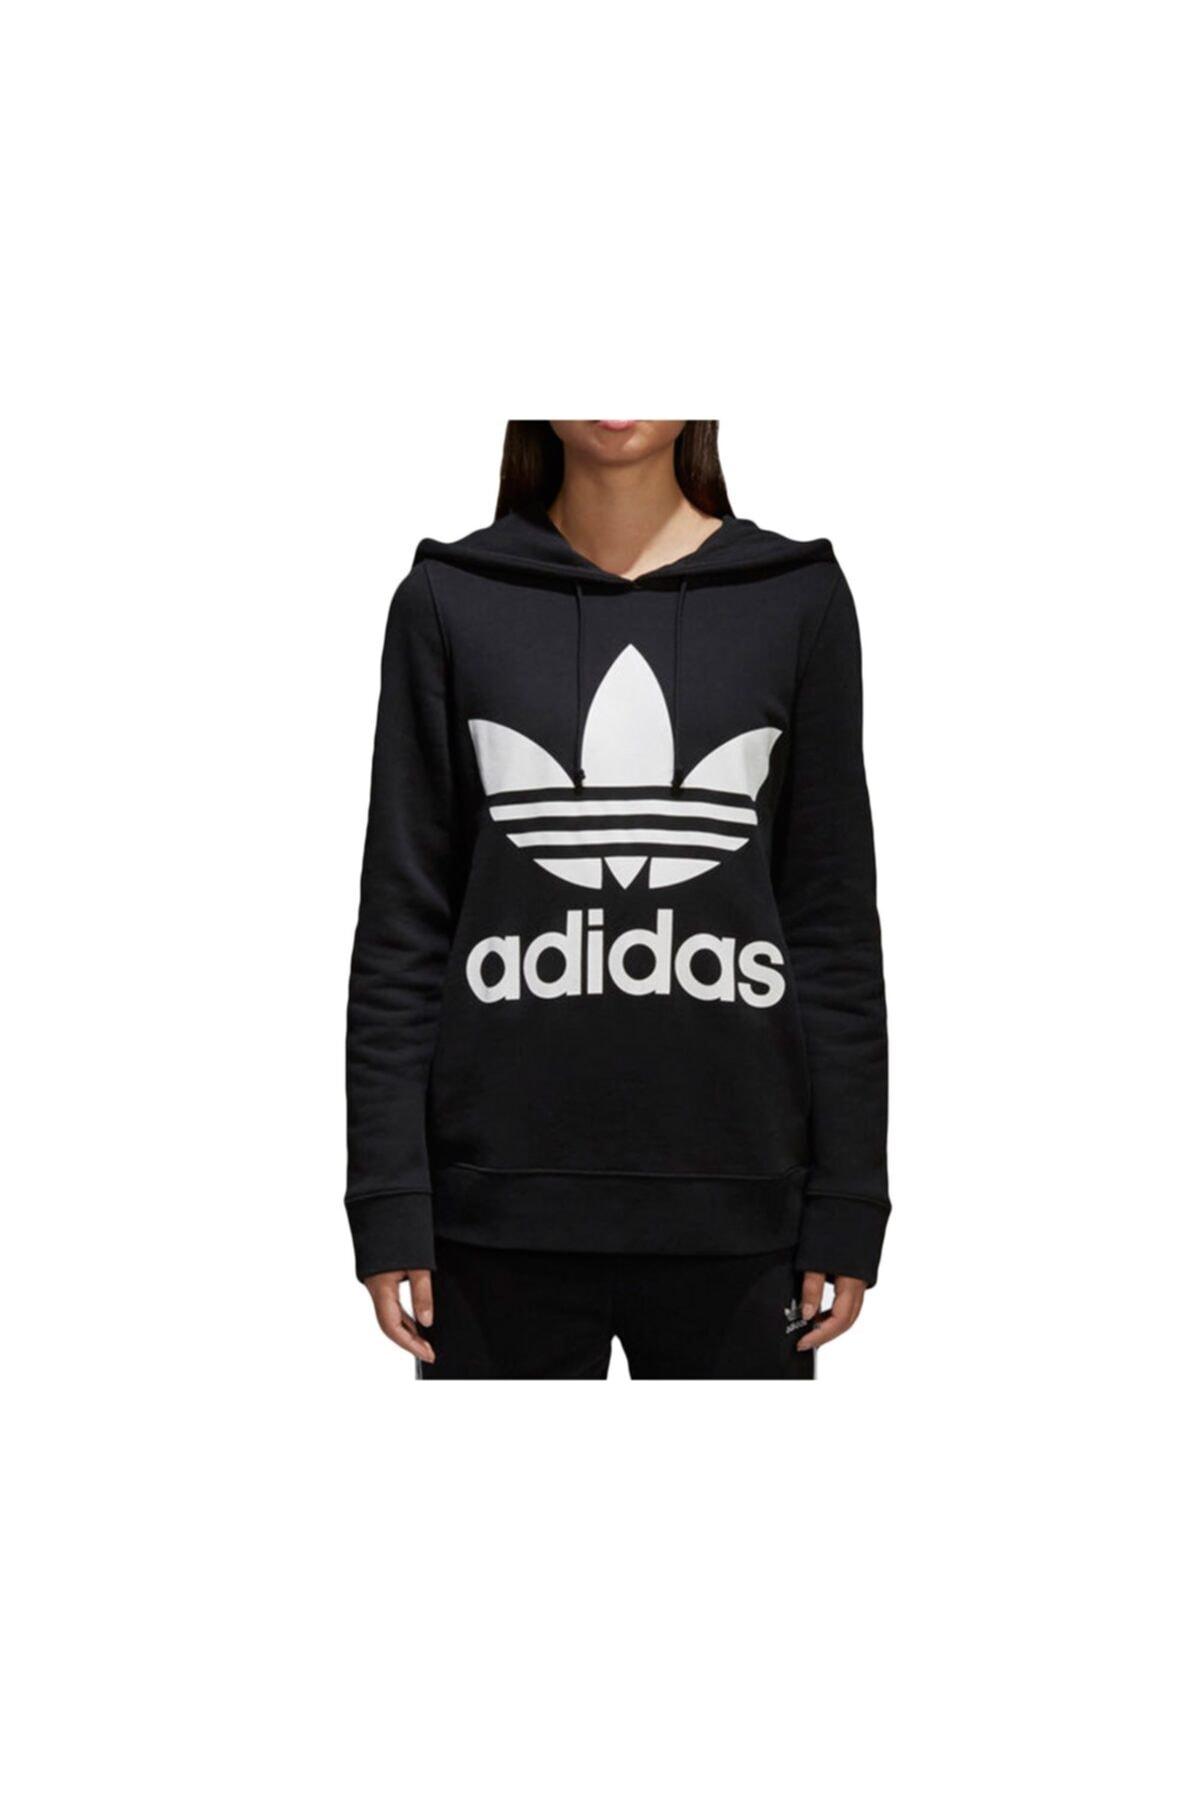 adidas Kadın Siyah Ce2408 Trefoıl Hoodıe Sweatshirt 1